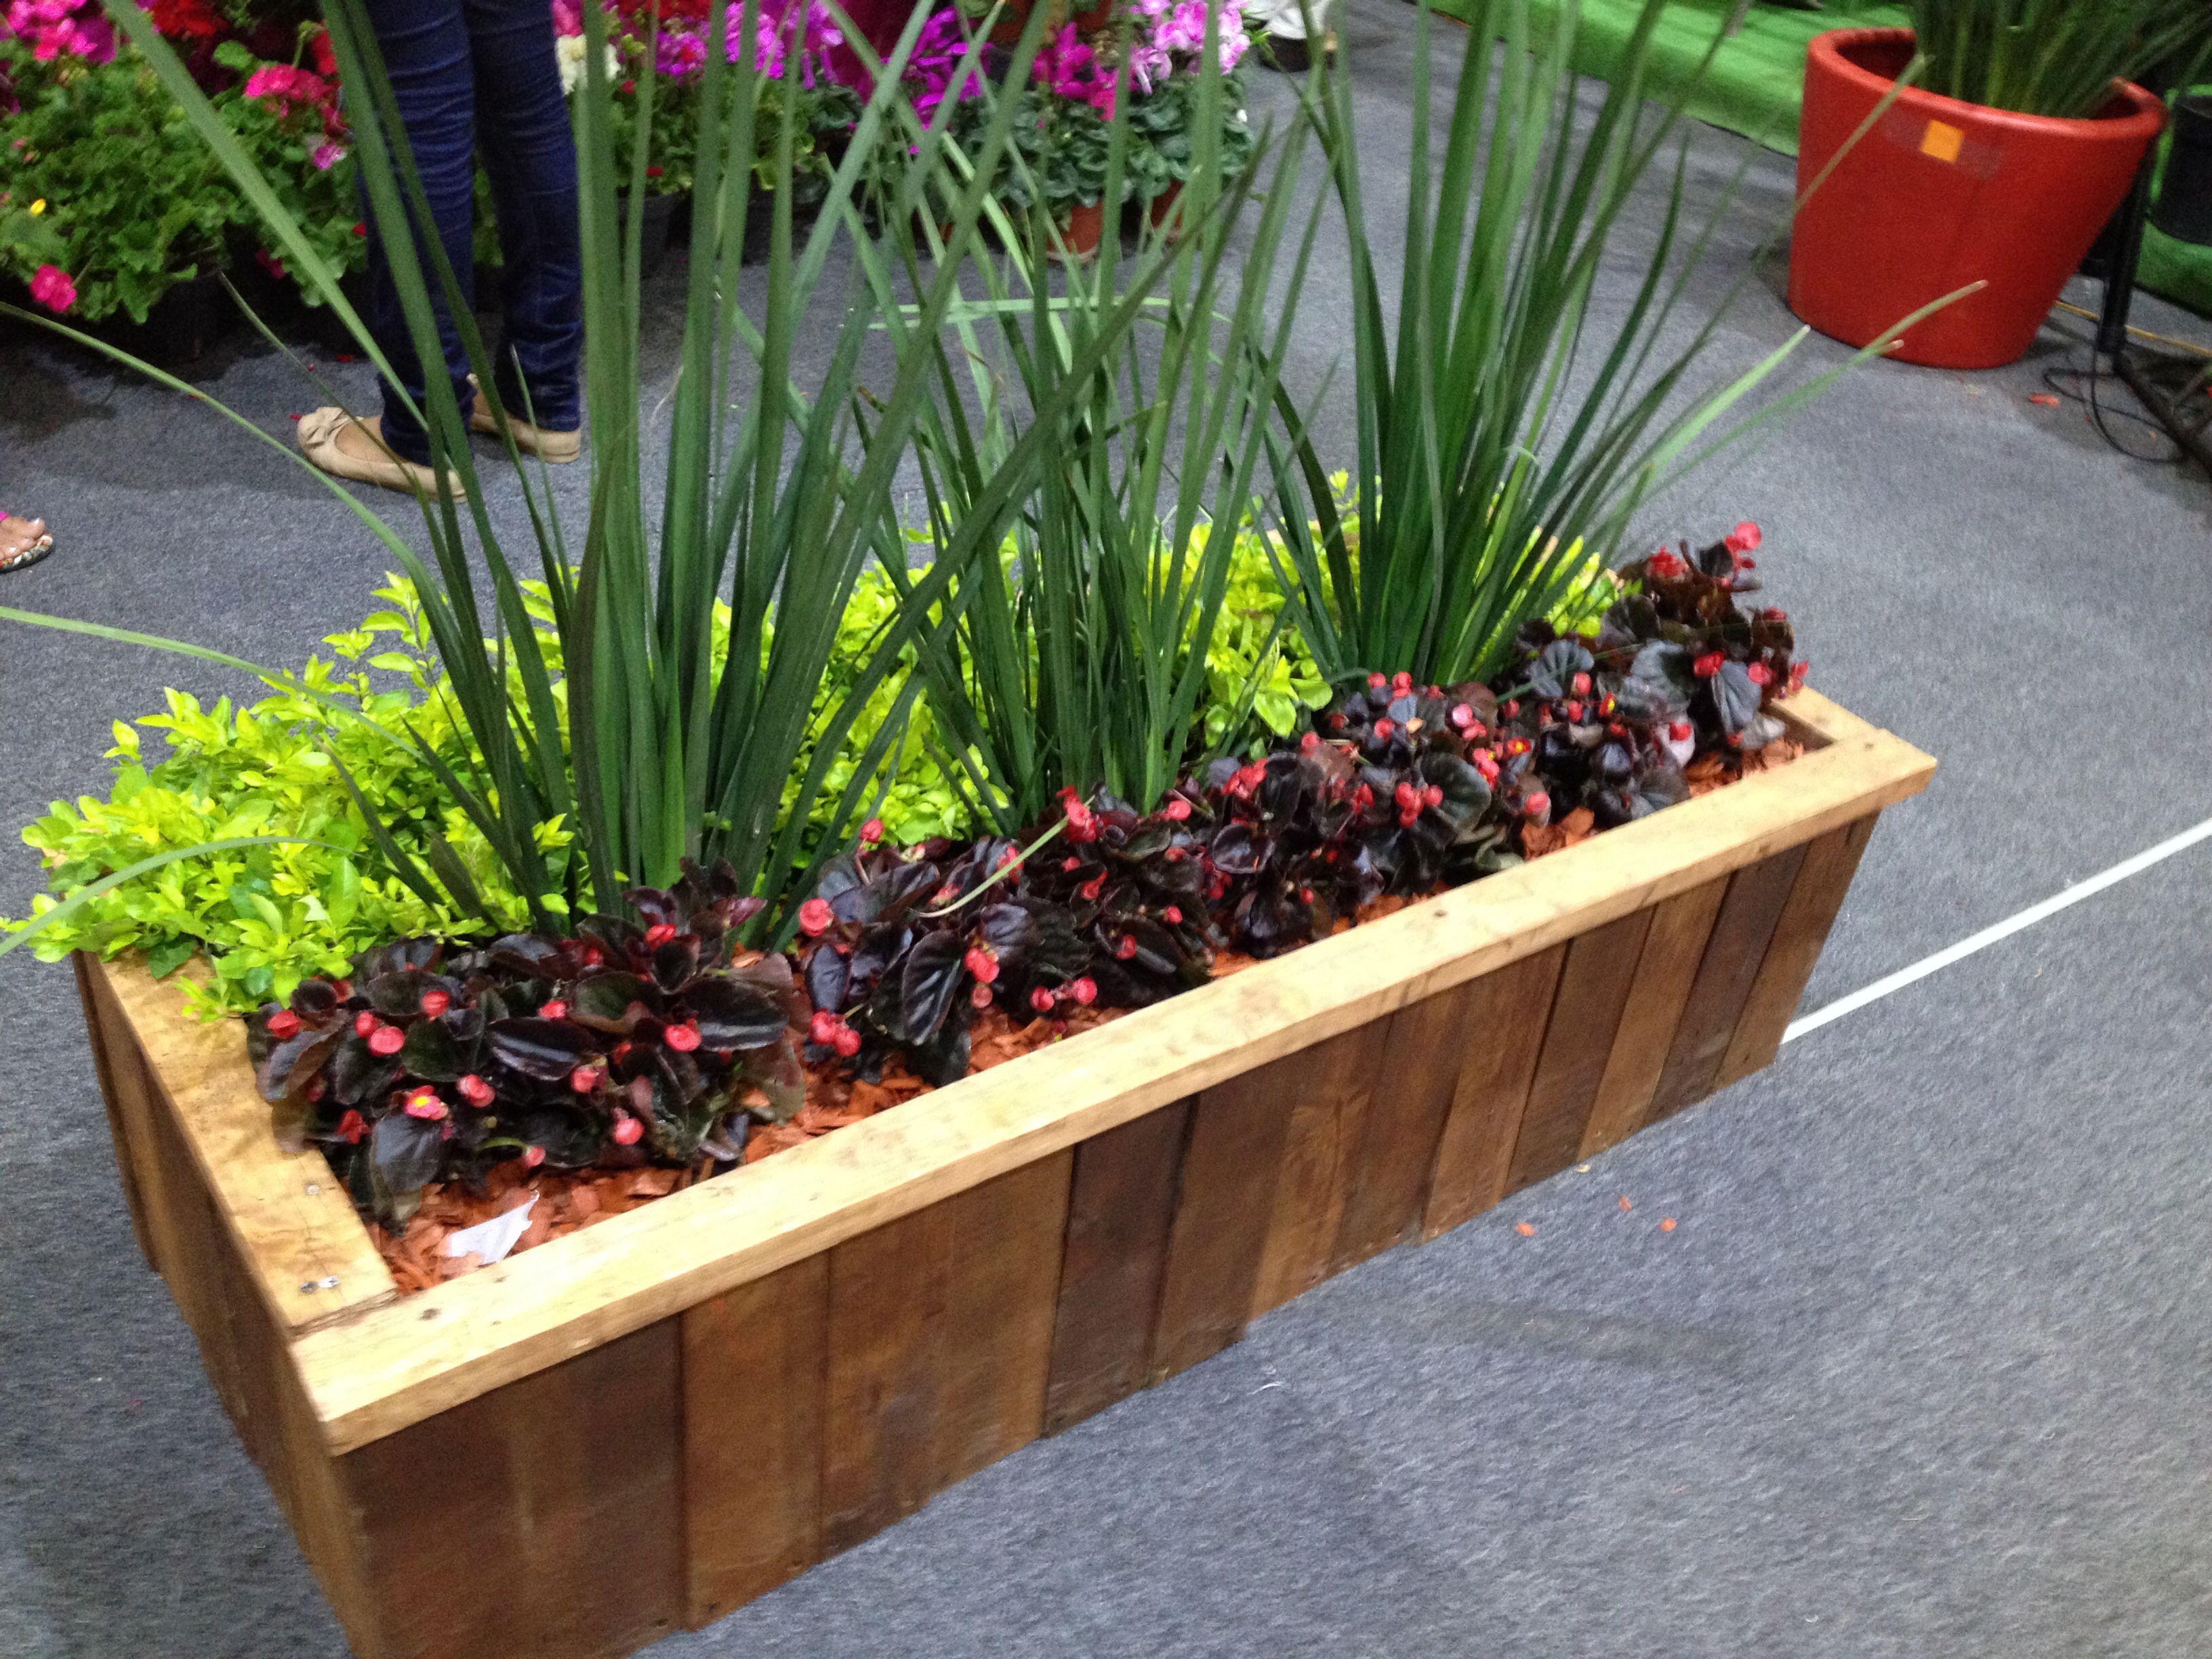 Macetero de madera reciclada vivero pinterest for Maceteros de madera para interior